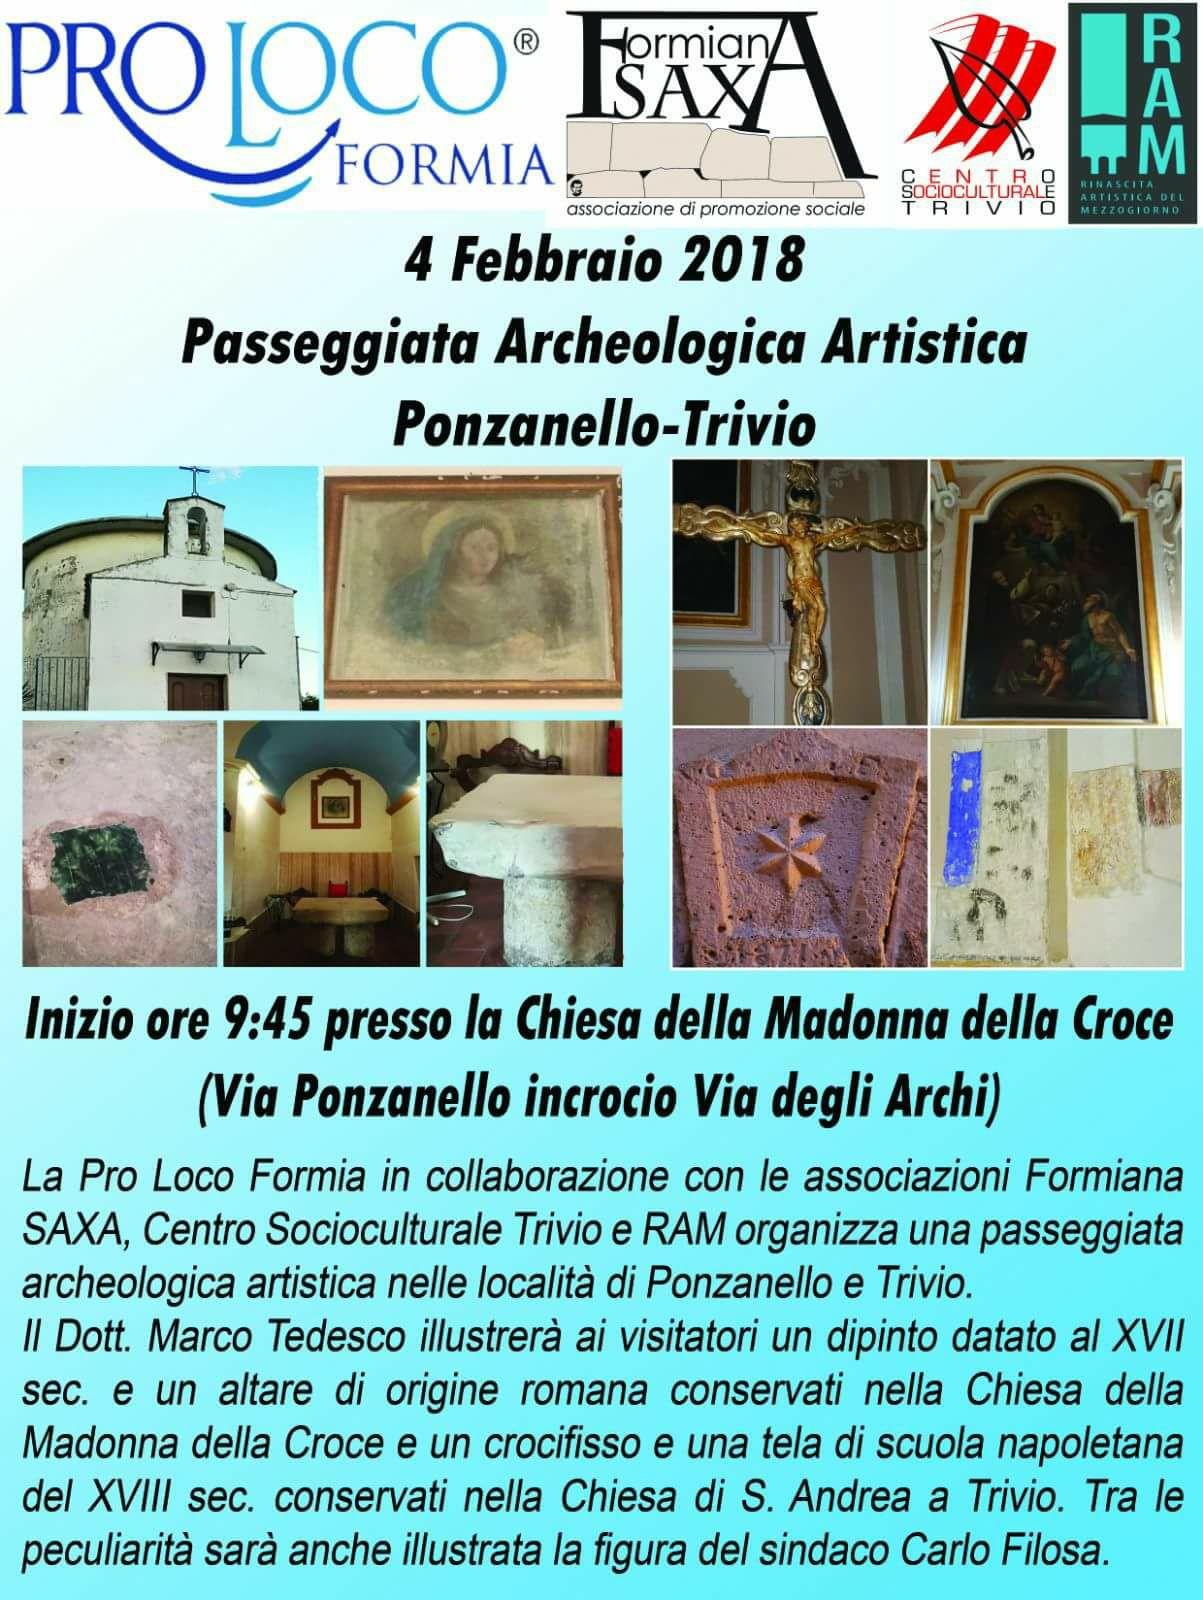 Passeggiata archeologica artistica a Trivio